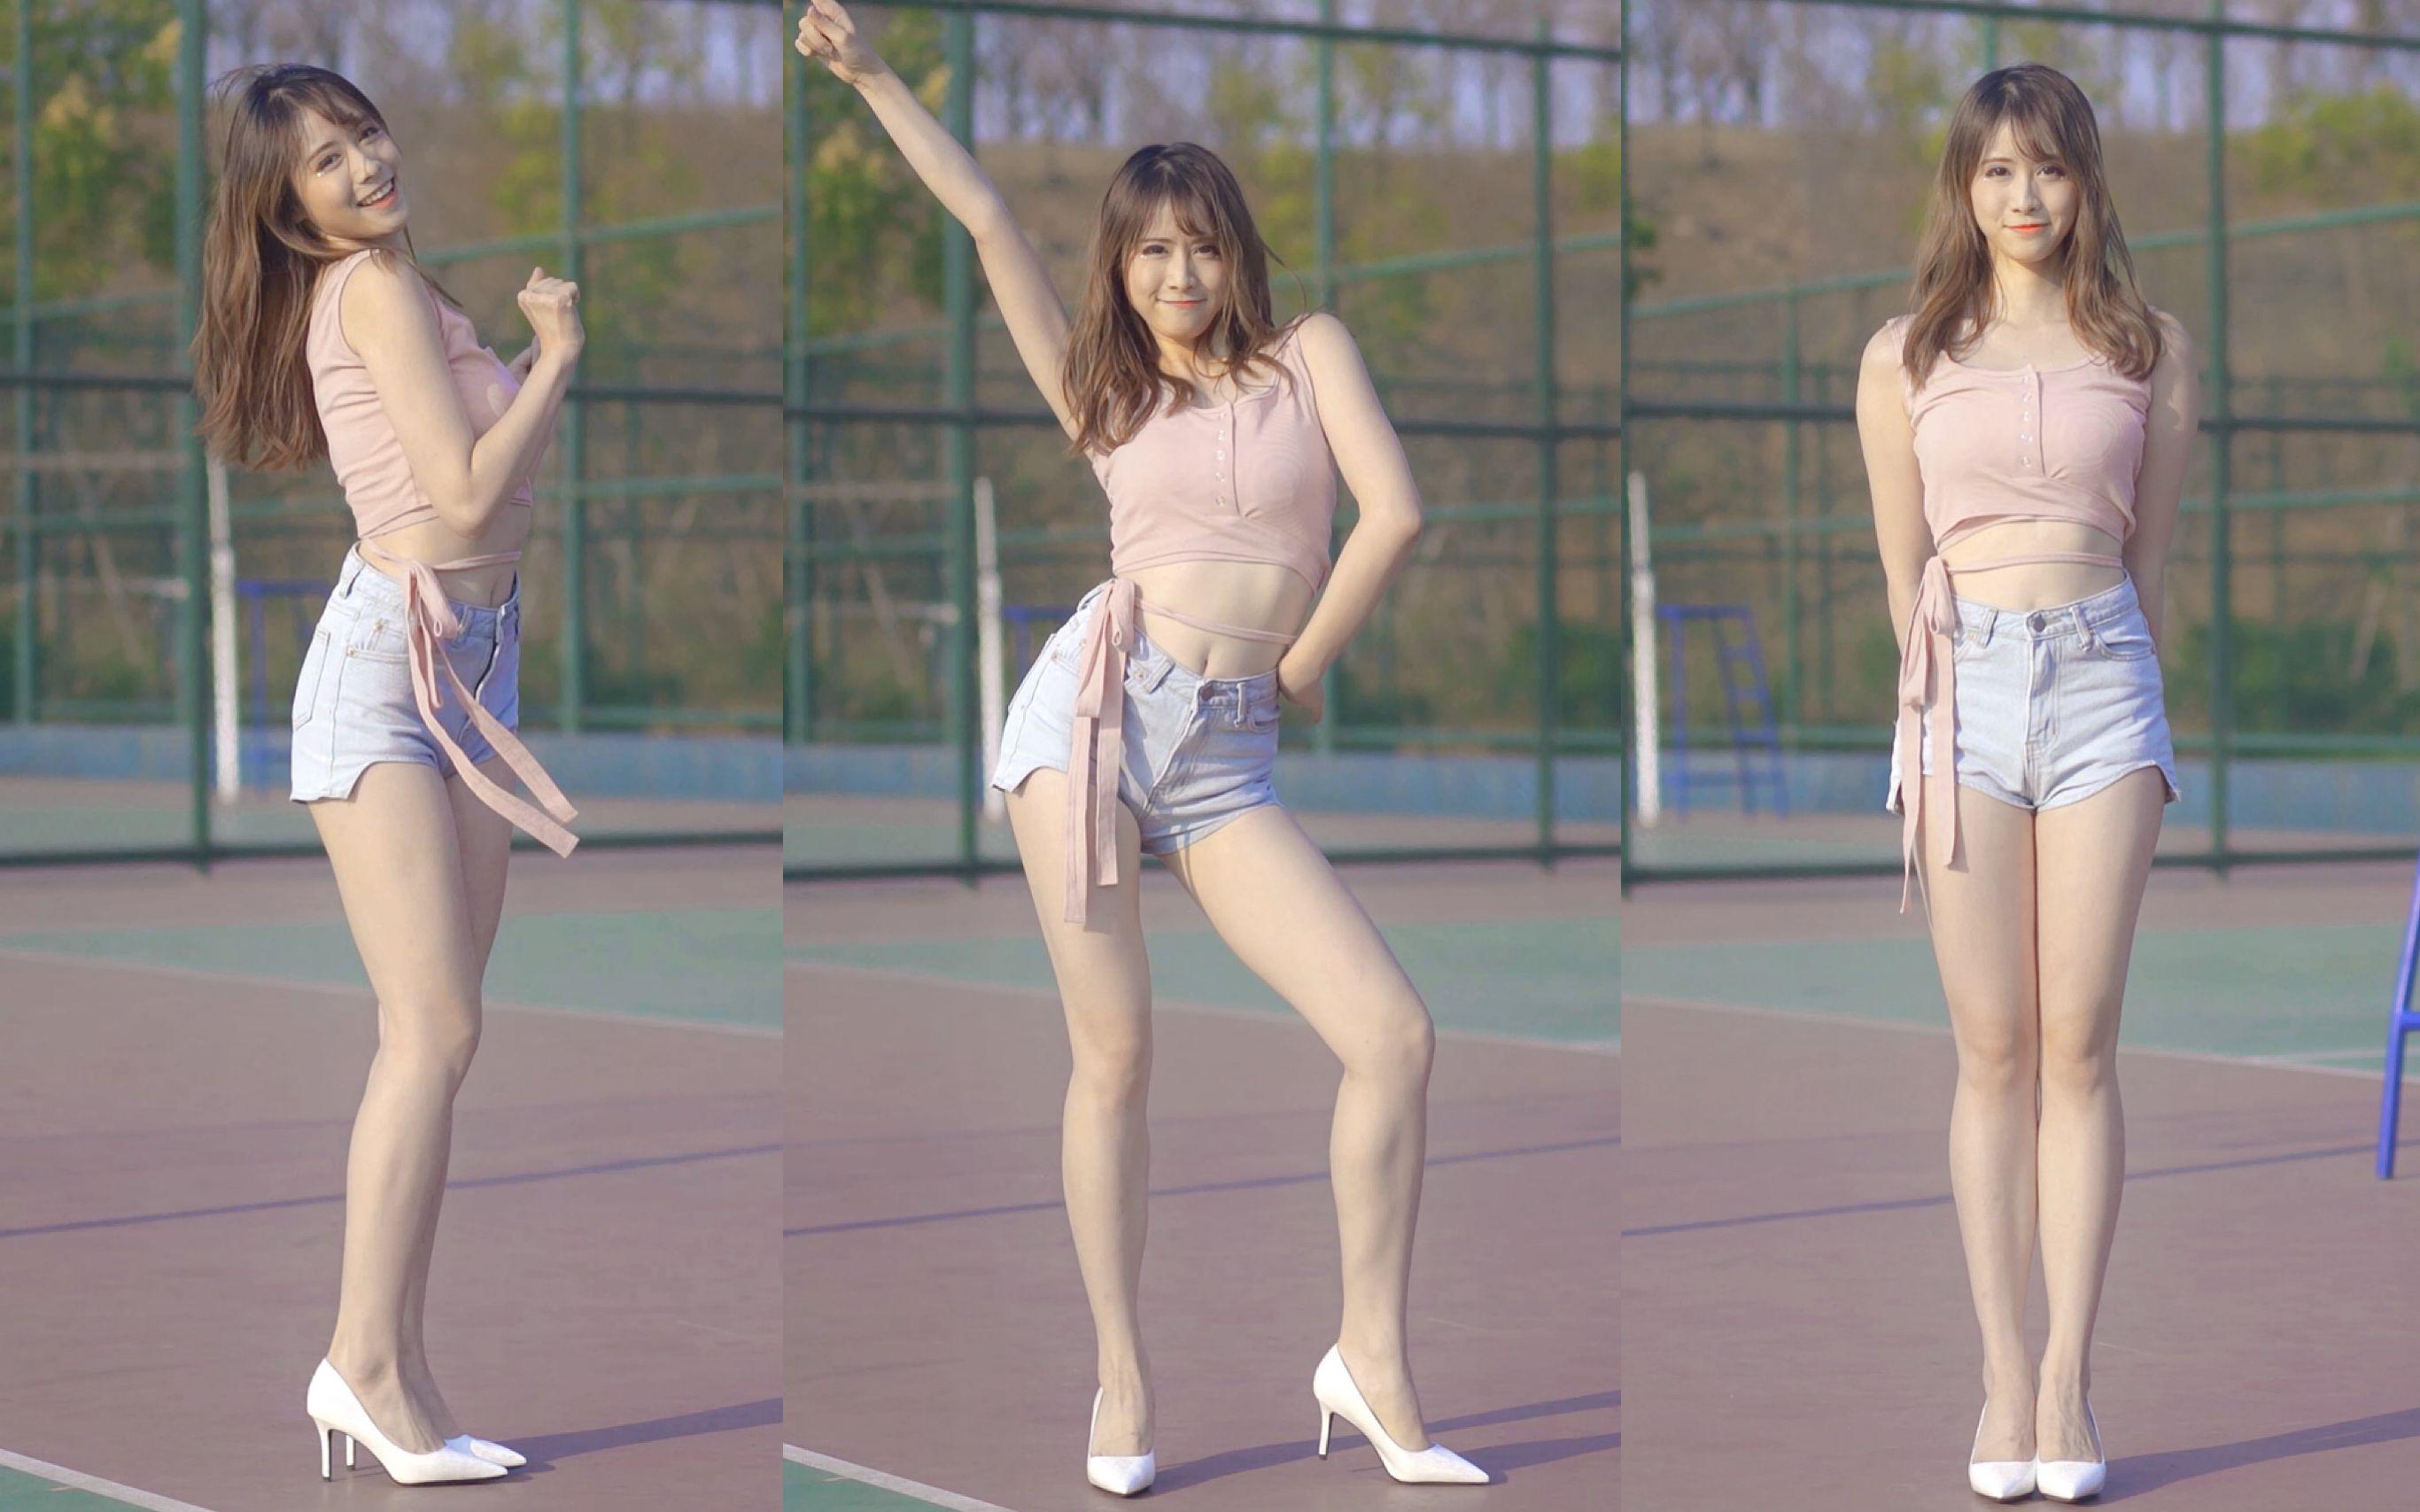 【小仙若】shake it !肉装警告